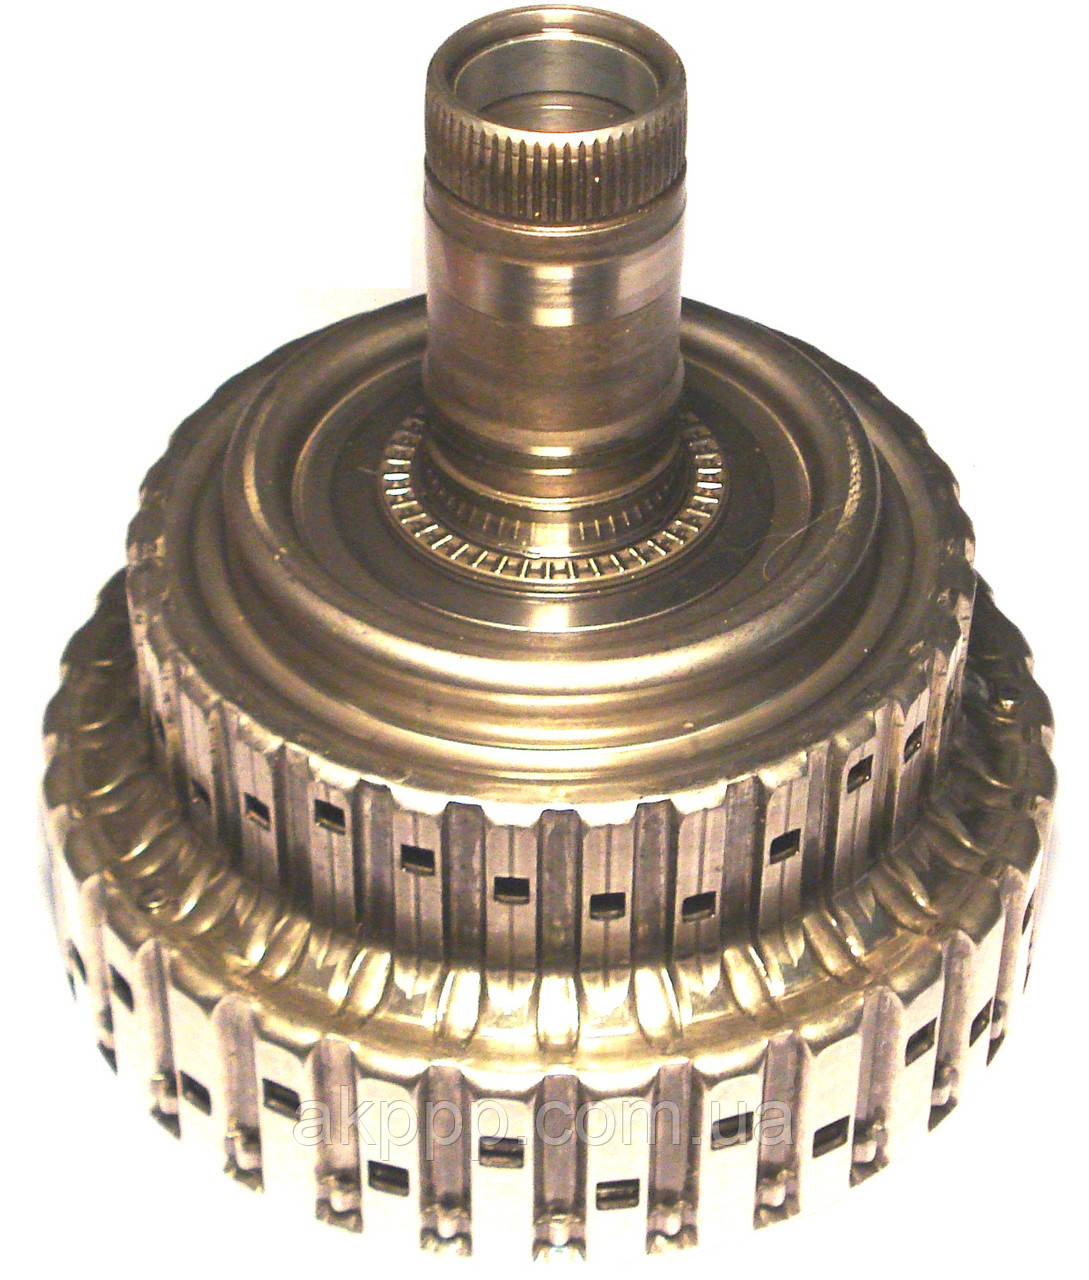 Акпп ZF6HP26, ZF6HP28 Барабан прямой передачи 1068272048 б/у